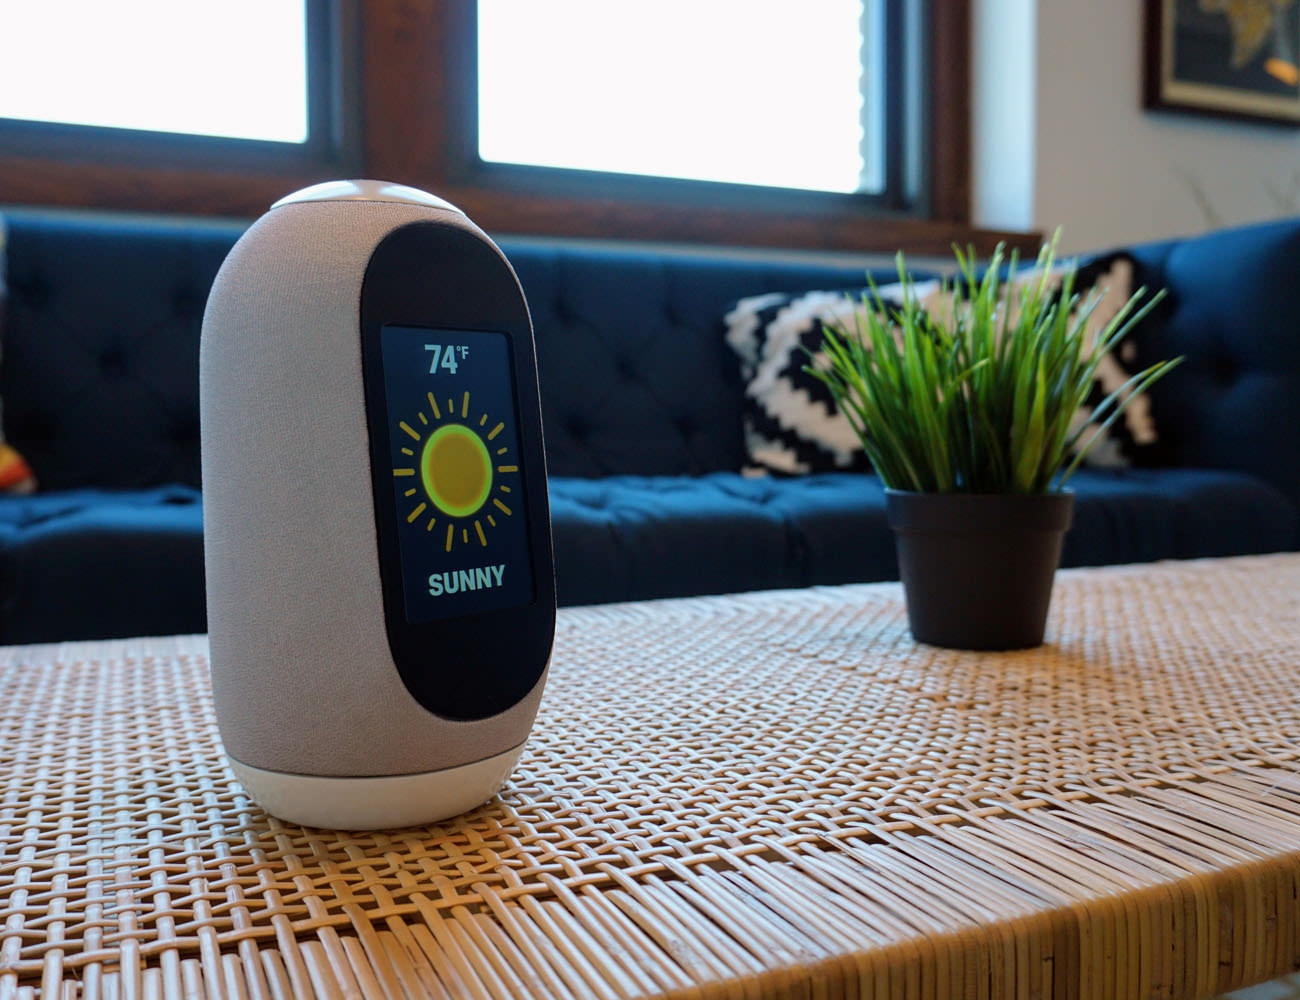 New Mycroft Open Voice Assistant and Smart Speaker